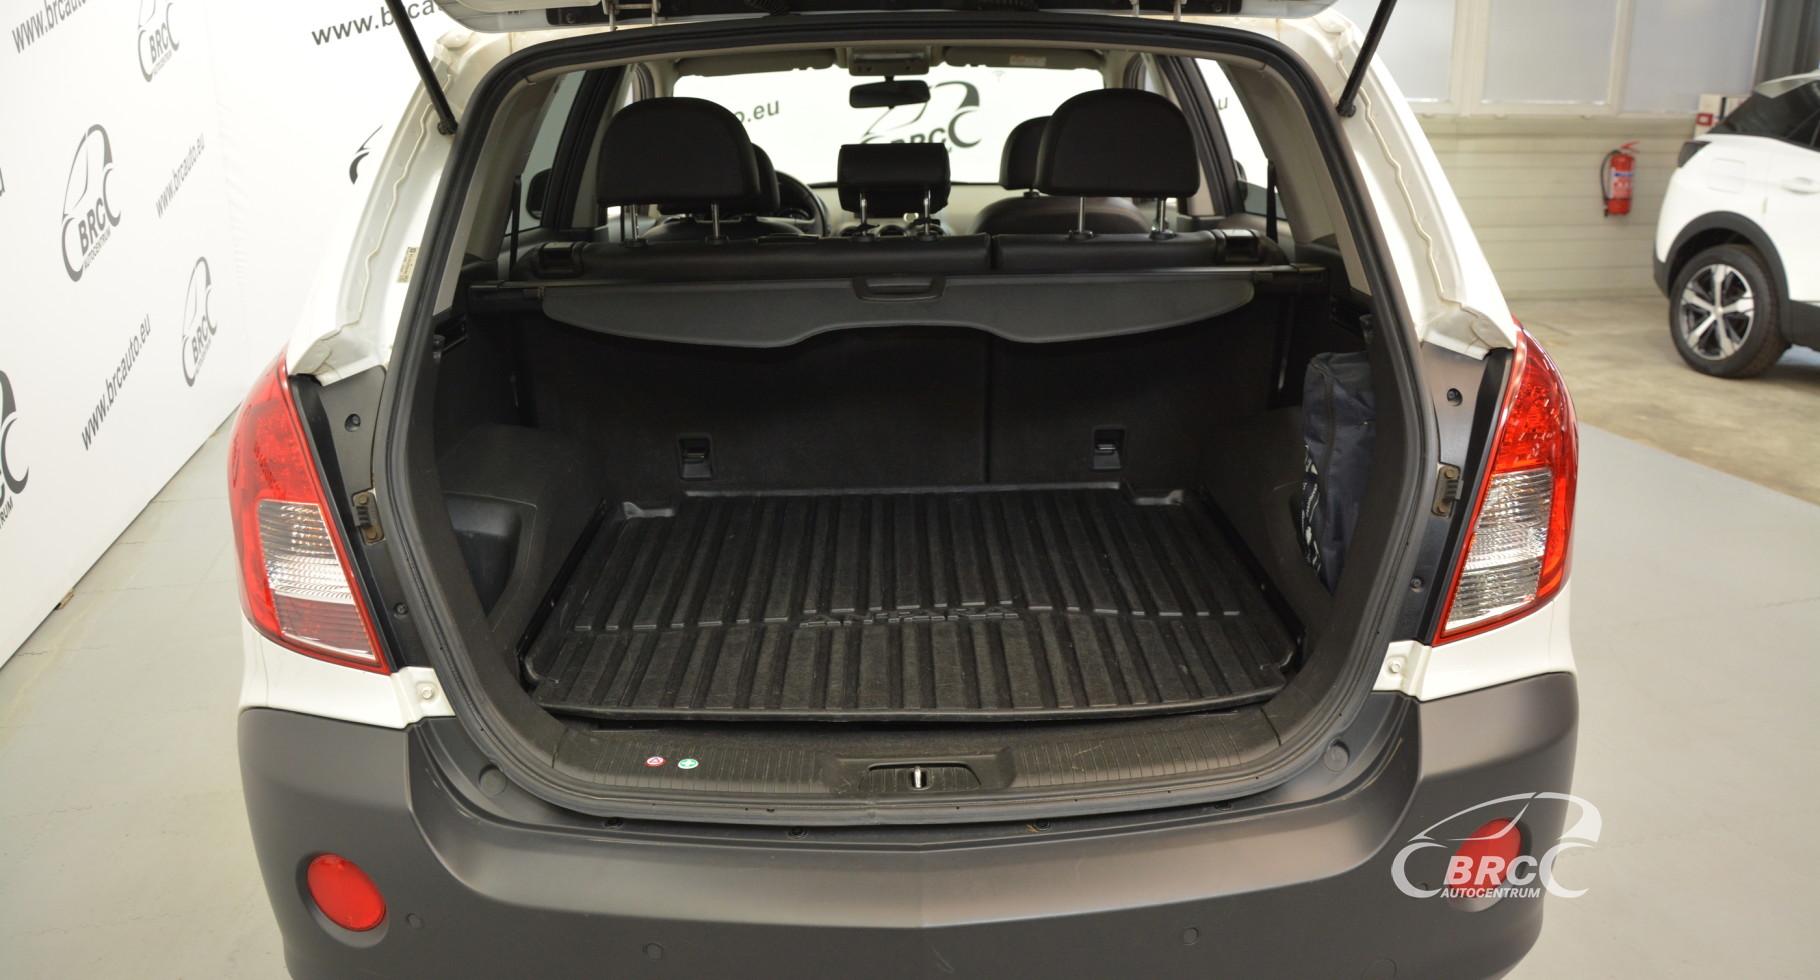 Opel Antara 2.2 CDTI FWD